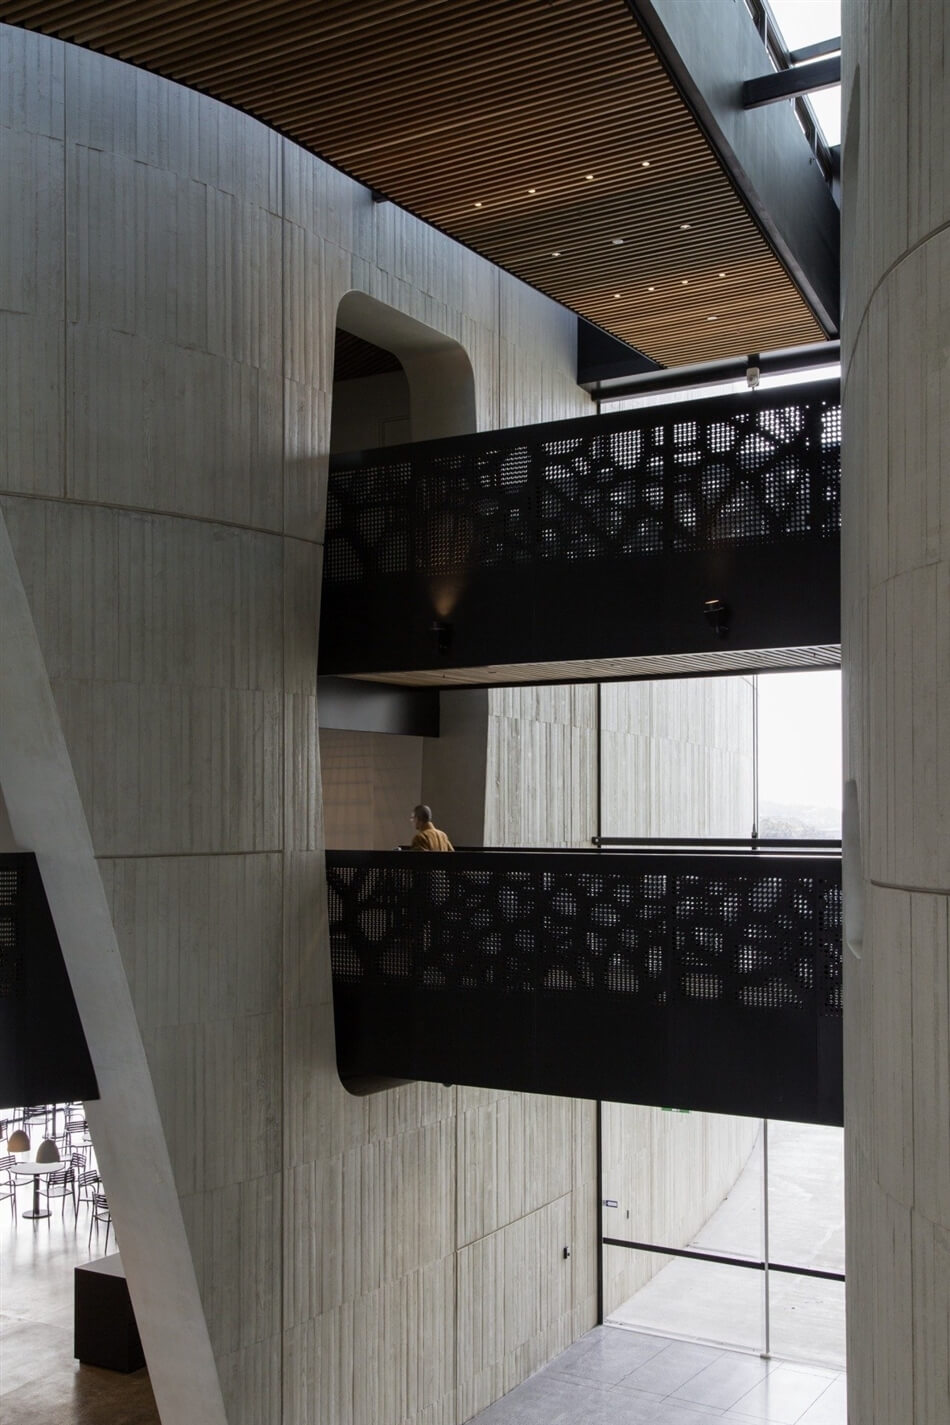 Nan Tien Education and Cultural Centre by Woods Bagott 003